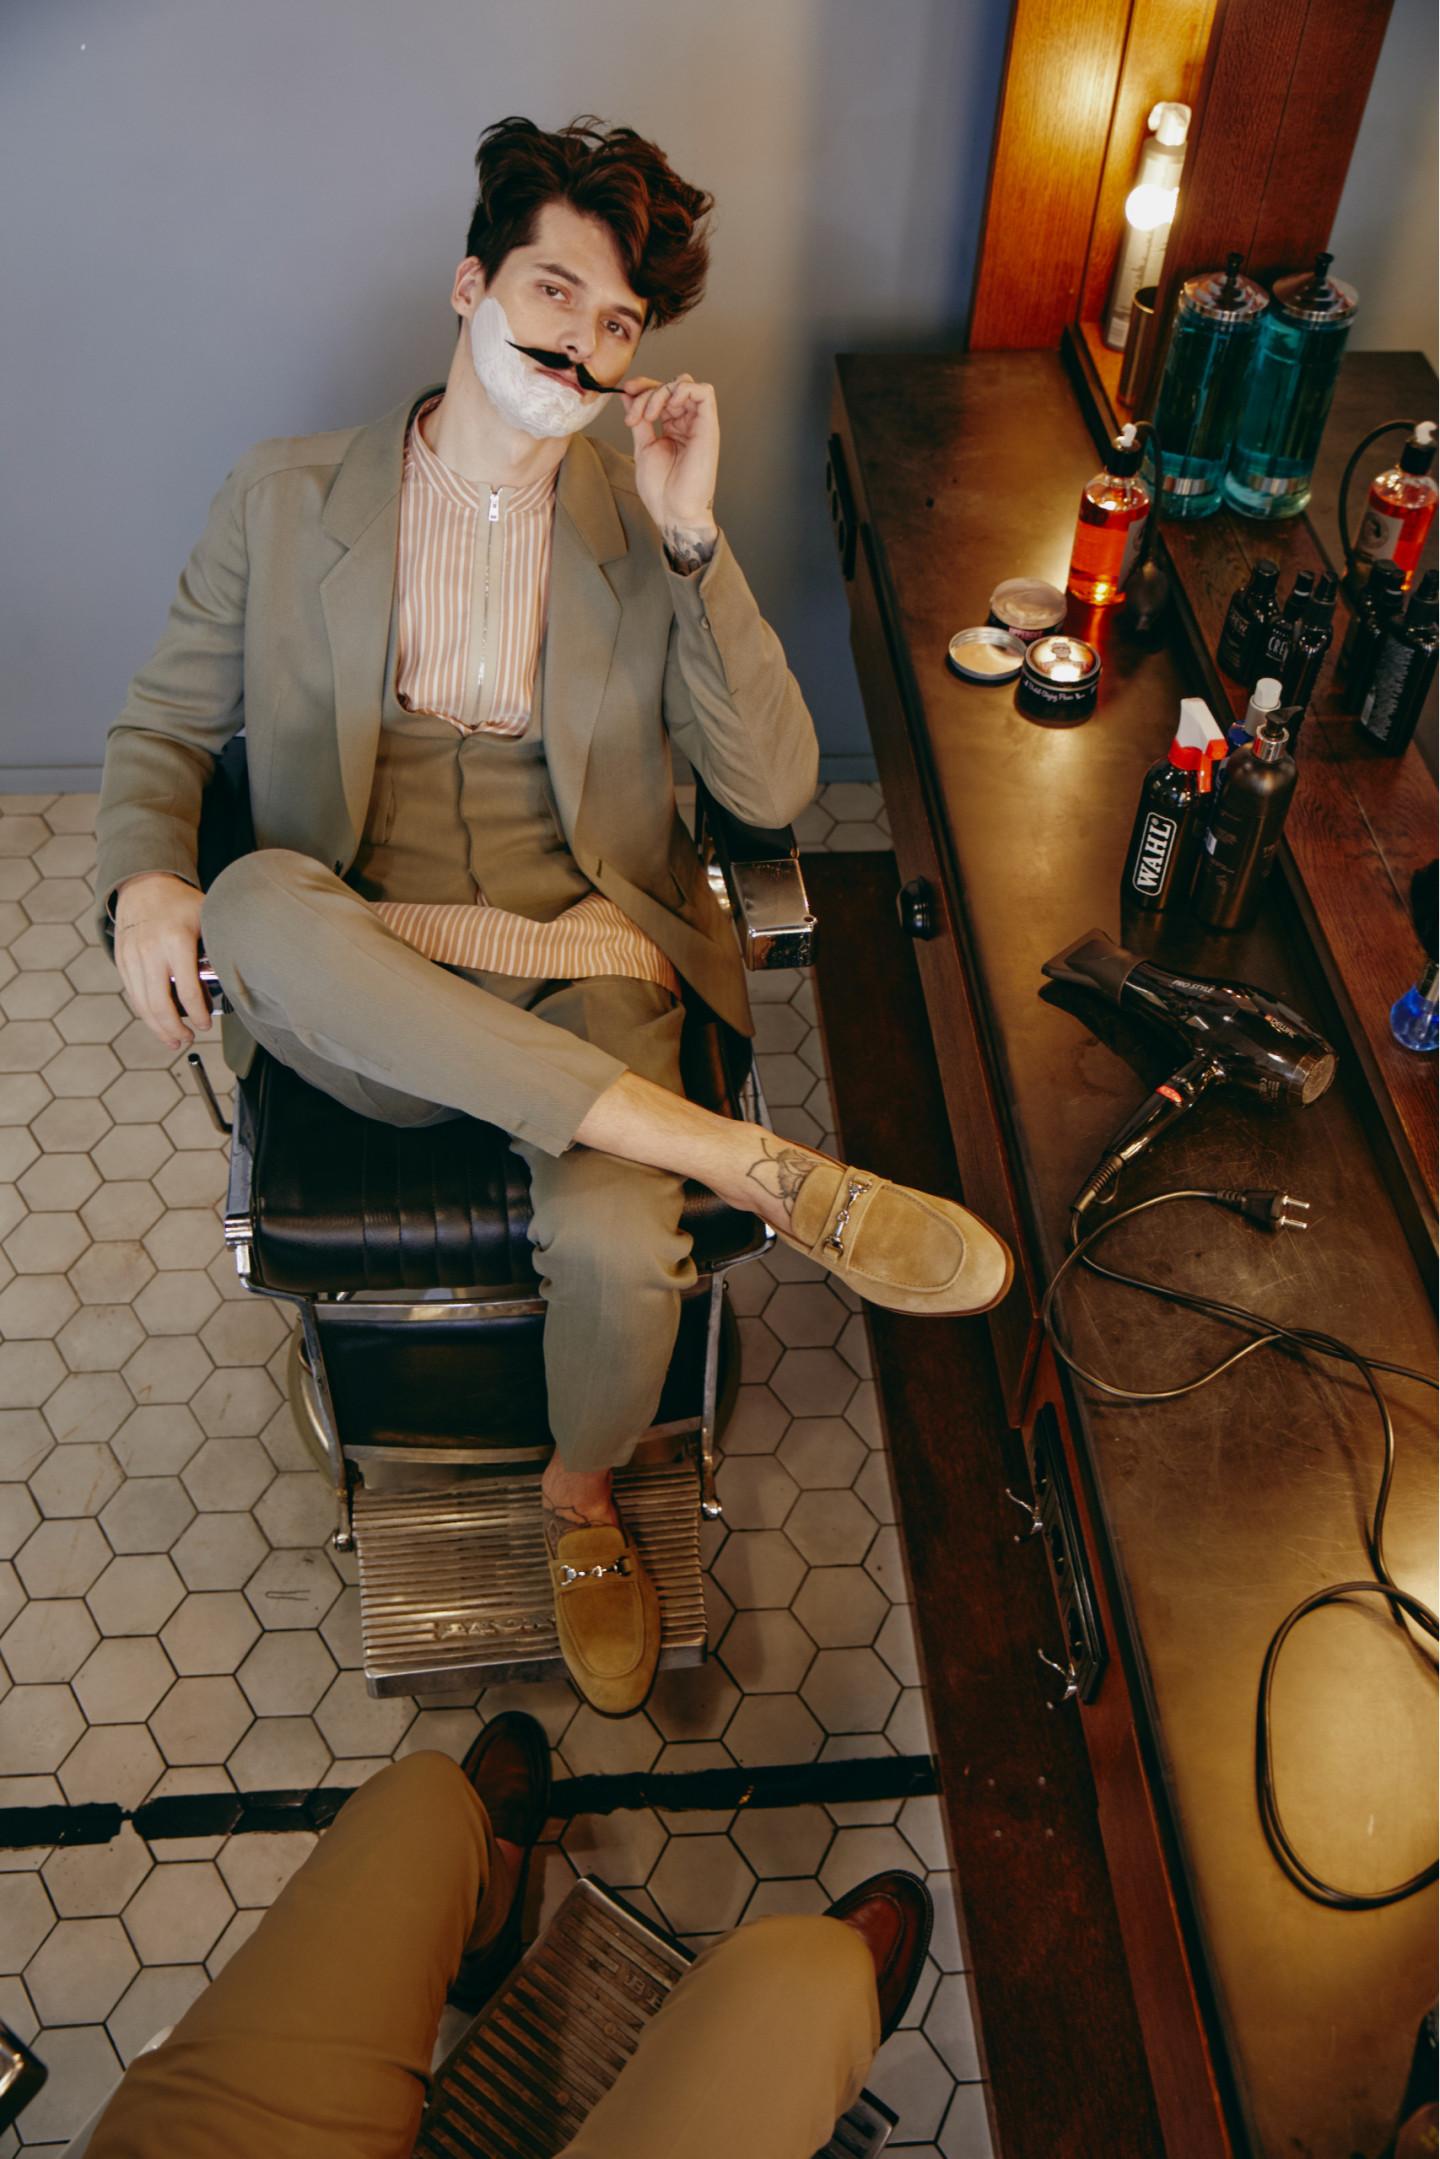 На Артуре: пиджак, брюки, сорочка, жилет — все Ermenegildo Zegna (бутик Ermenegildo Zegna); ботинки Doucal's (No One) На Евгении: брюки Boggi Milano (ТРЦ «Афимолл Сити»); ботинки Geox (ТРЦ «Европейский»)